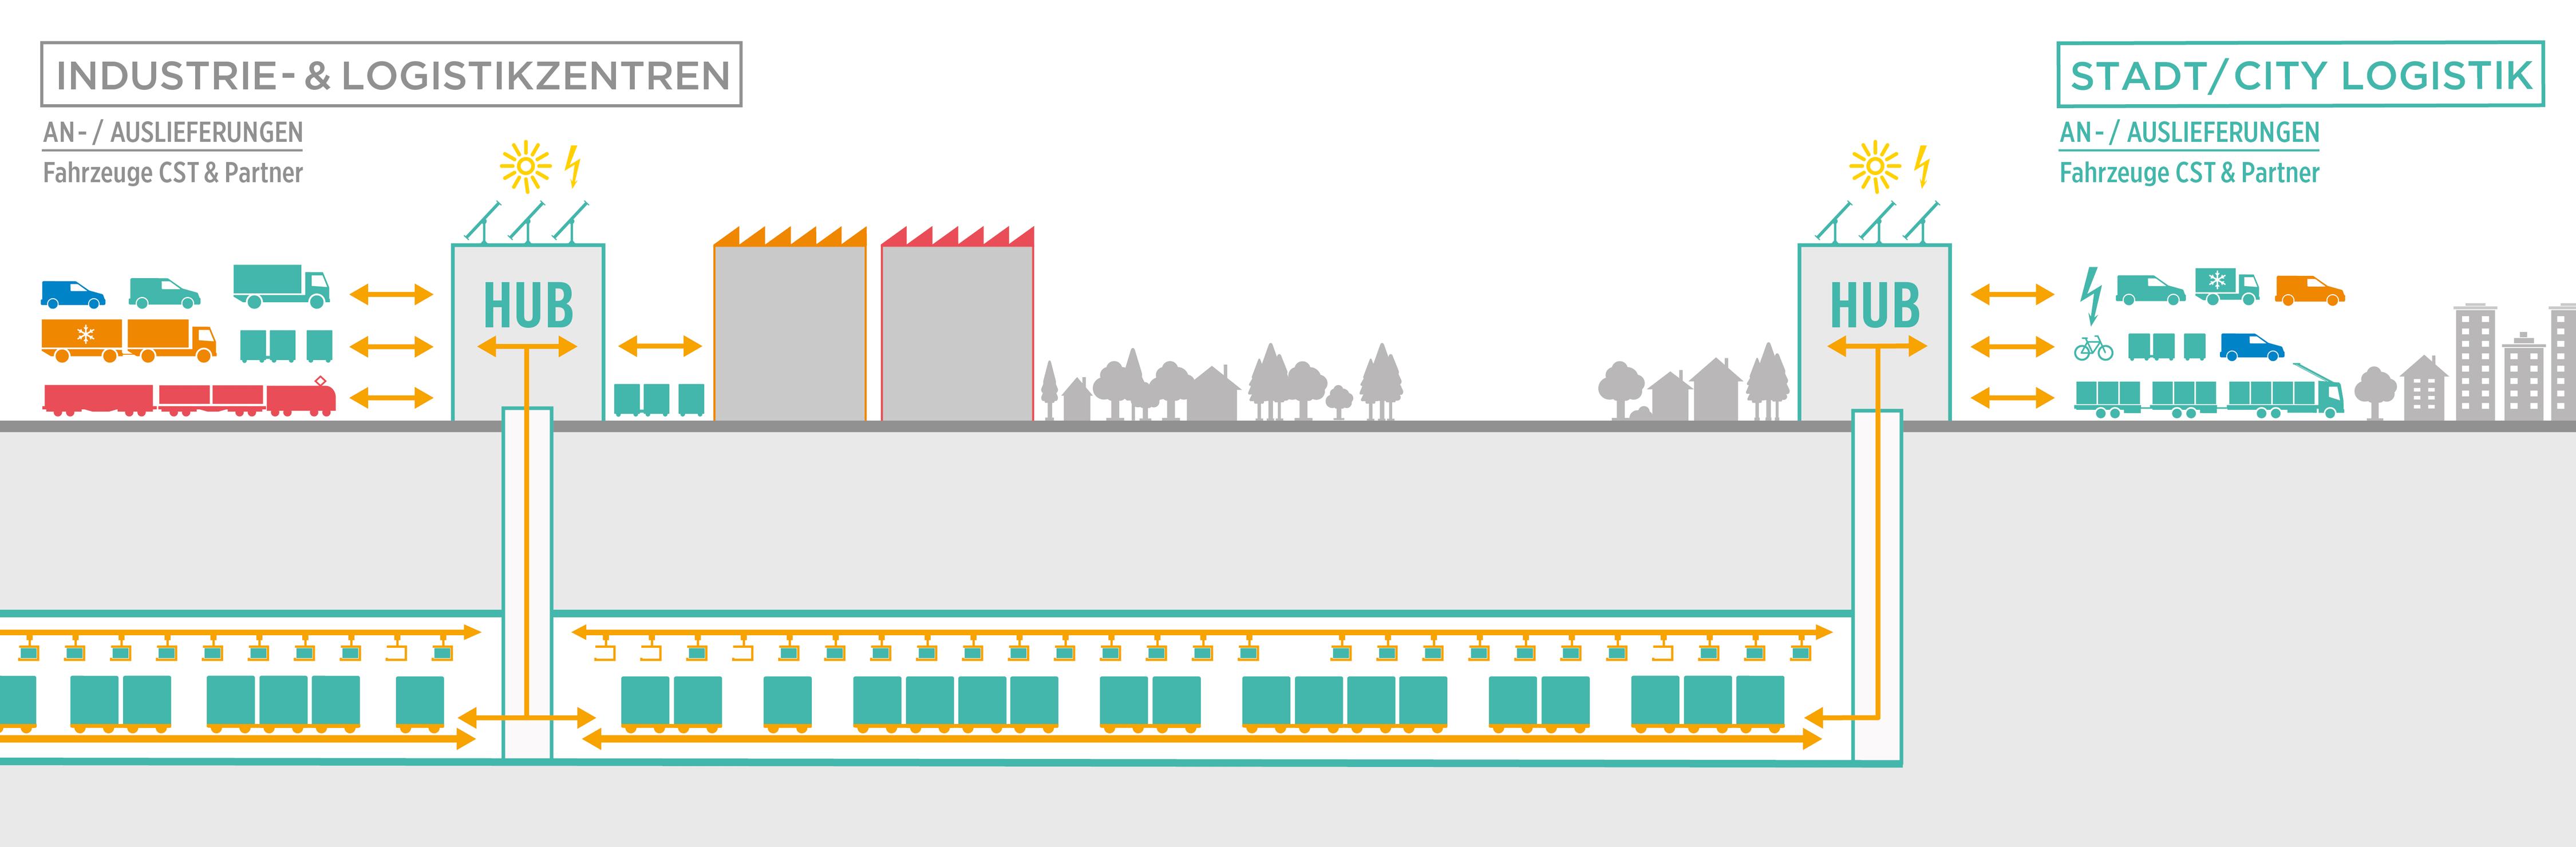 NAX Report 01/18: Tunnelprojekt Cargo Sous Terrain